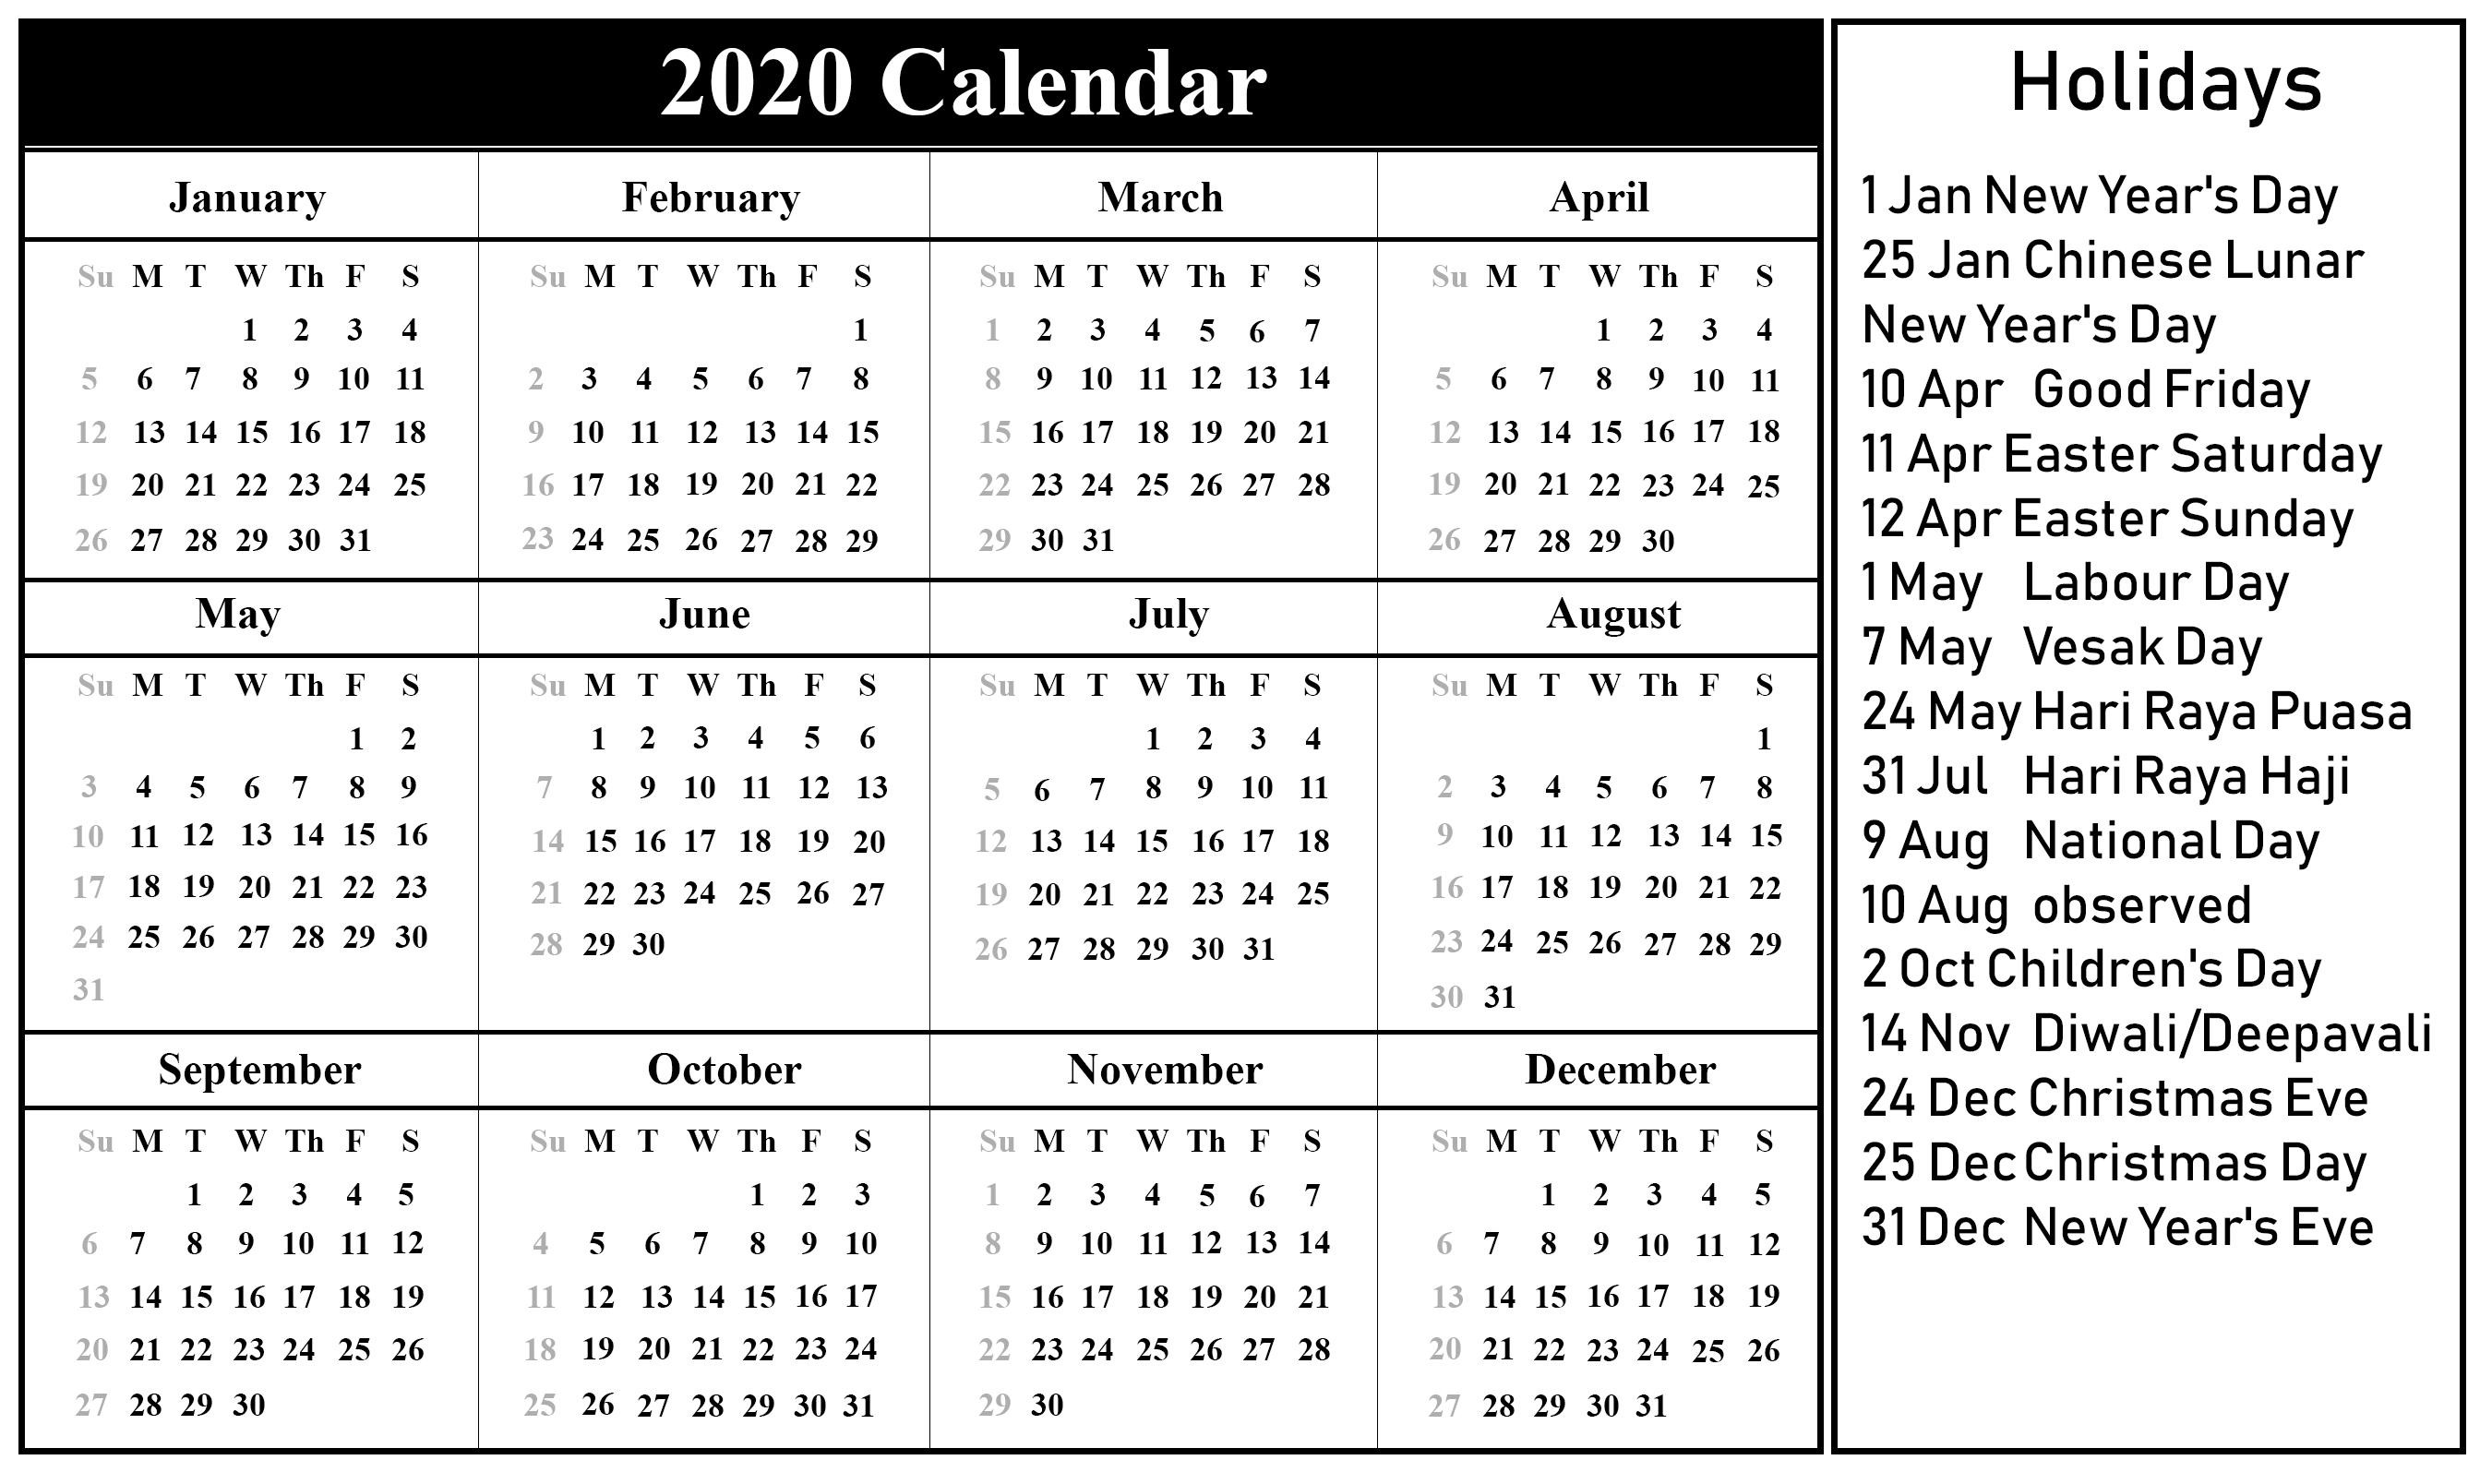 Free Printable Blank Calendar 2020 With Usa Holidays Download